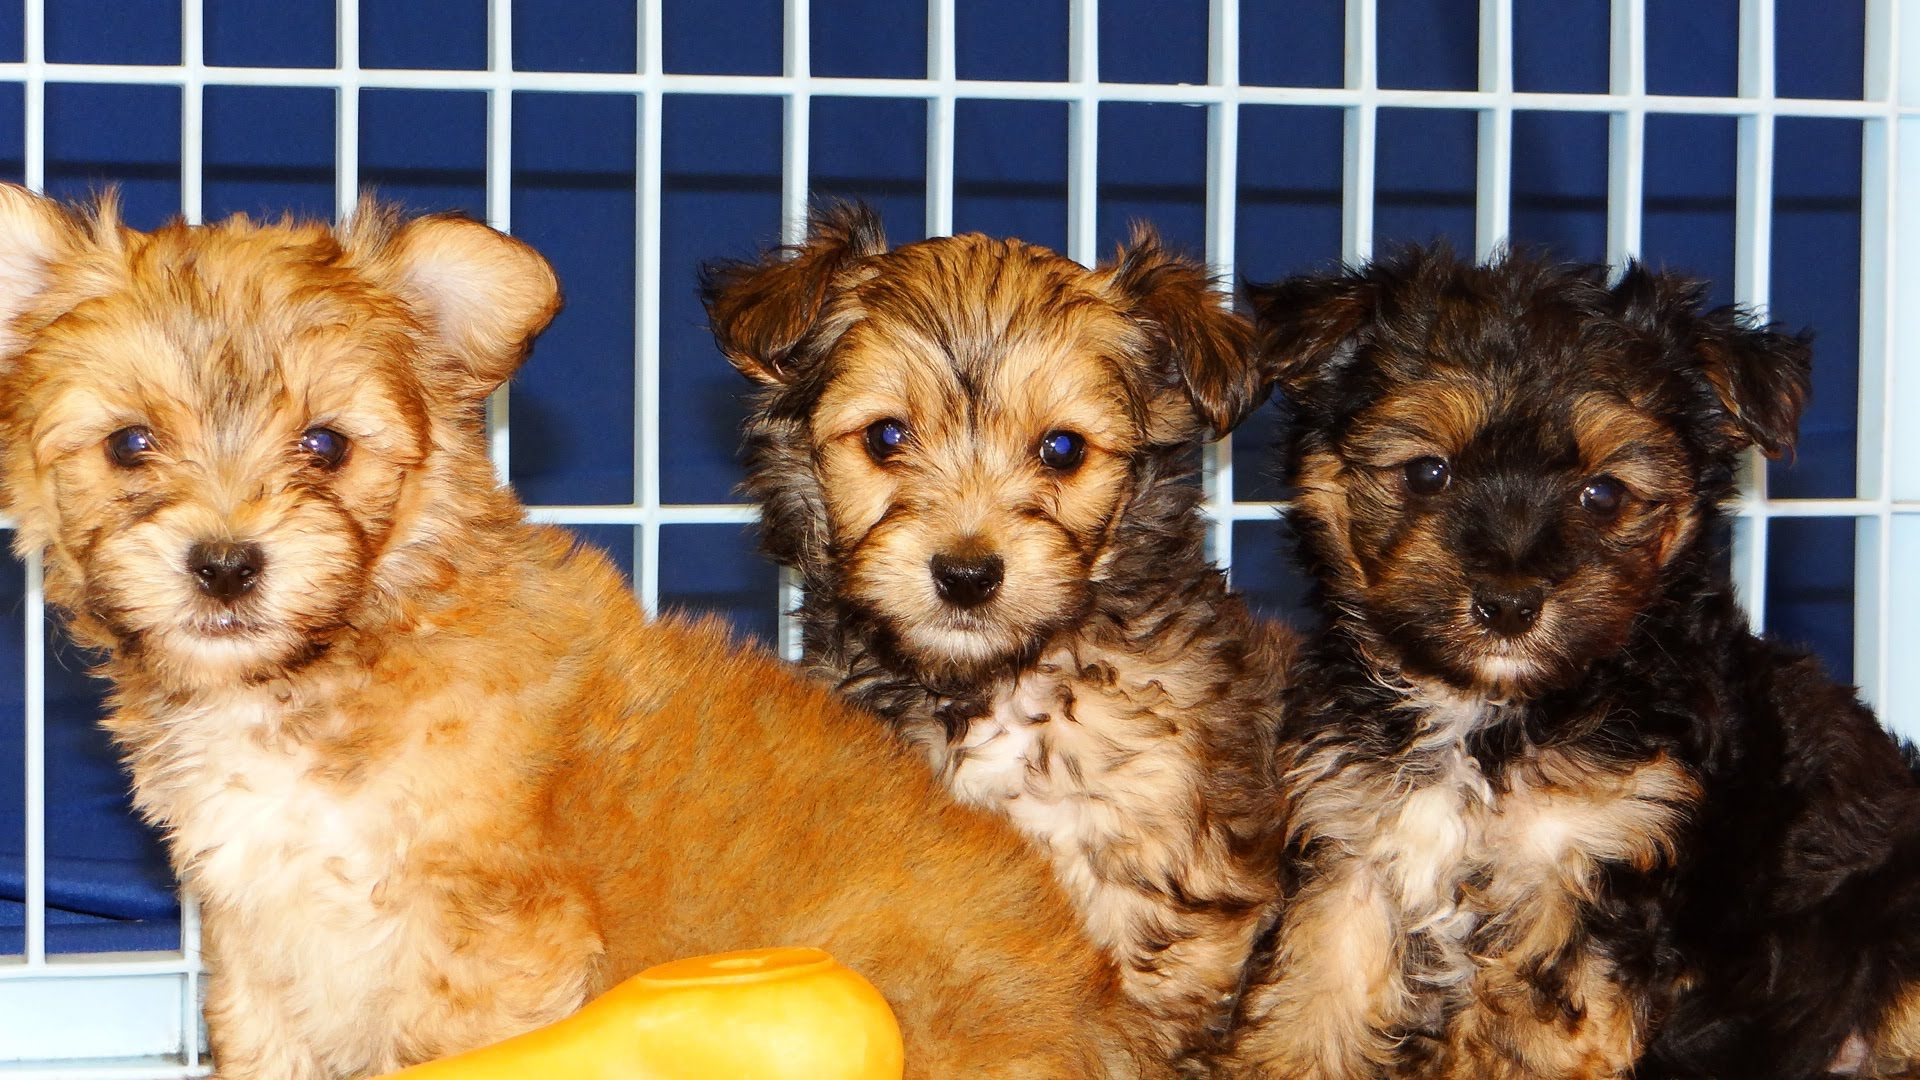 Havashire Puppies For Sale In Atlanta Georgia Ga Macon Savannah Augu Puppies For Sale Savannah Chat Puppies